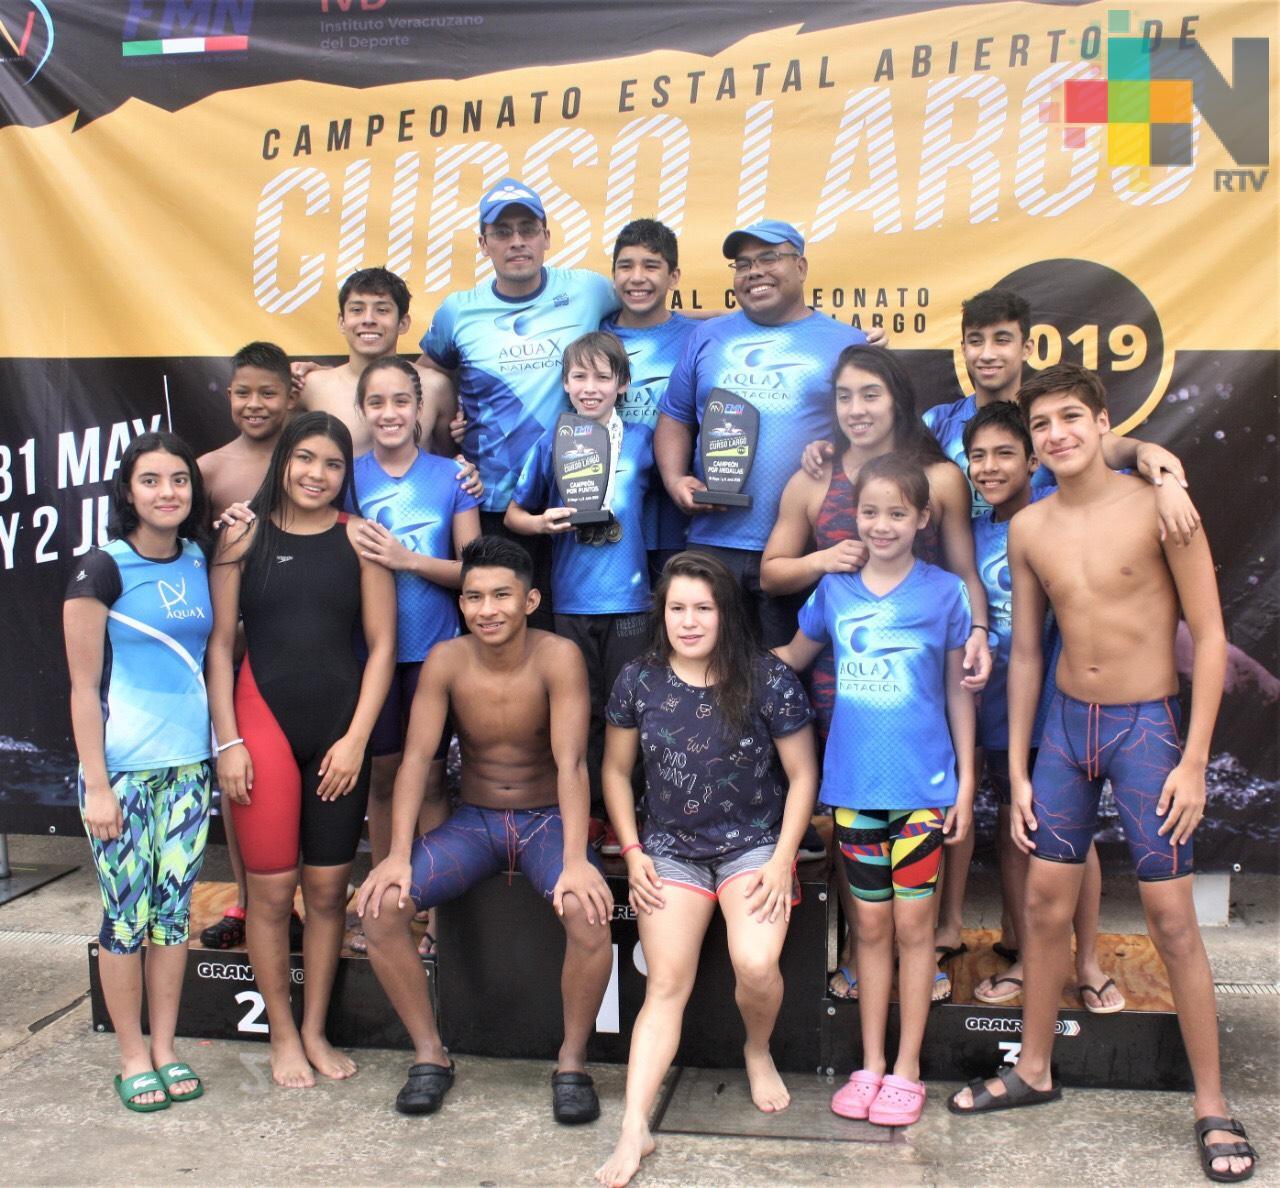 Conquista Club Aquax, Campeonato Estatal Curso Largo 2019